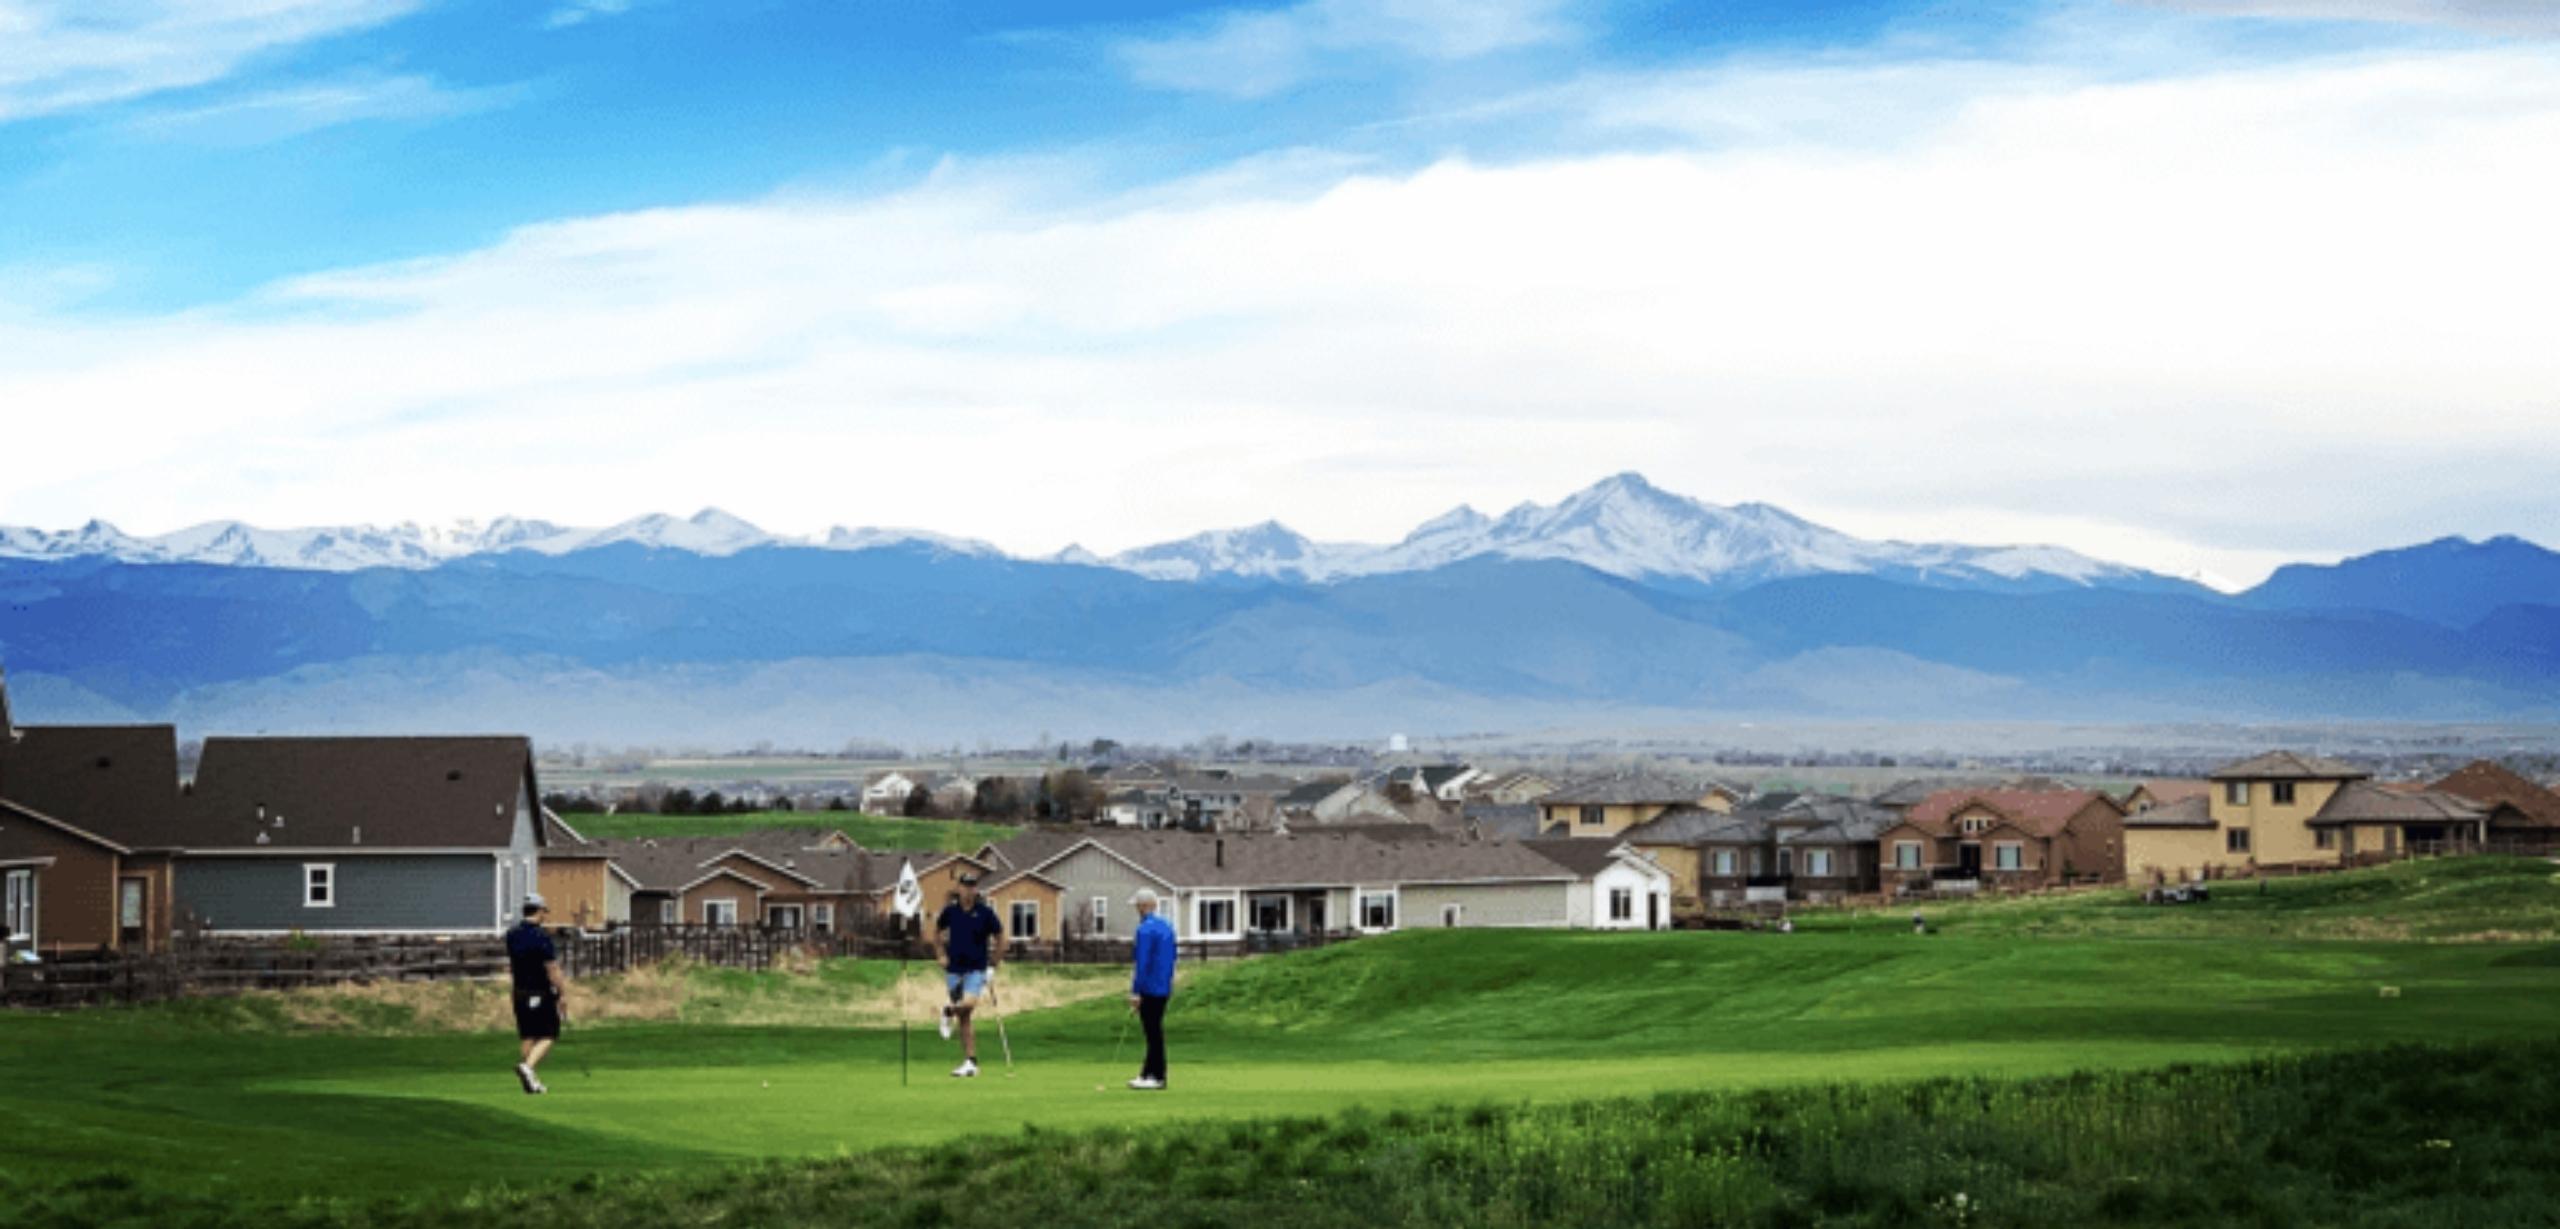 Erie Colorado Boulder Valley Longs Peak View Colorado National Golf Club University of Colorado Golf Course Vista Ridge